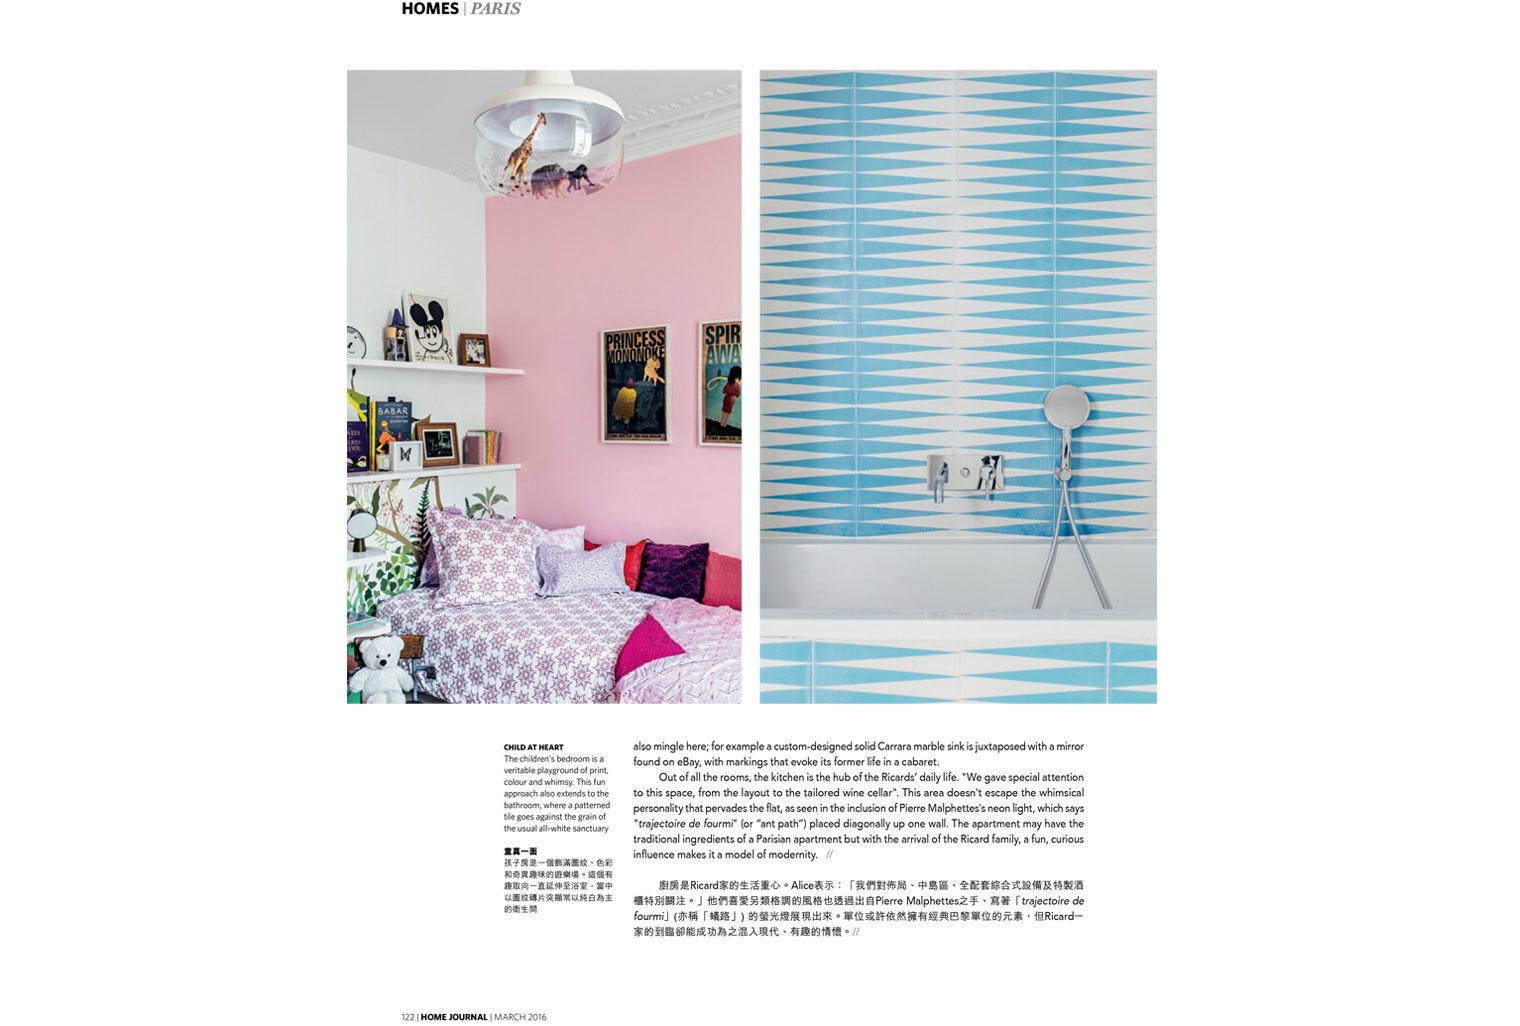 Tapis Ladybugs et linge de lit Mazurka grenadine dans Home Magazine HK